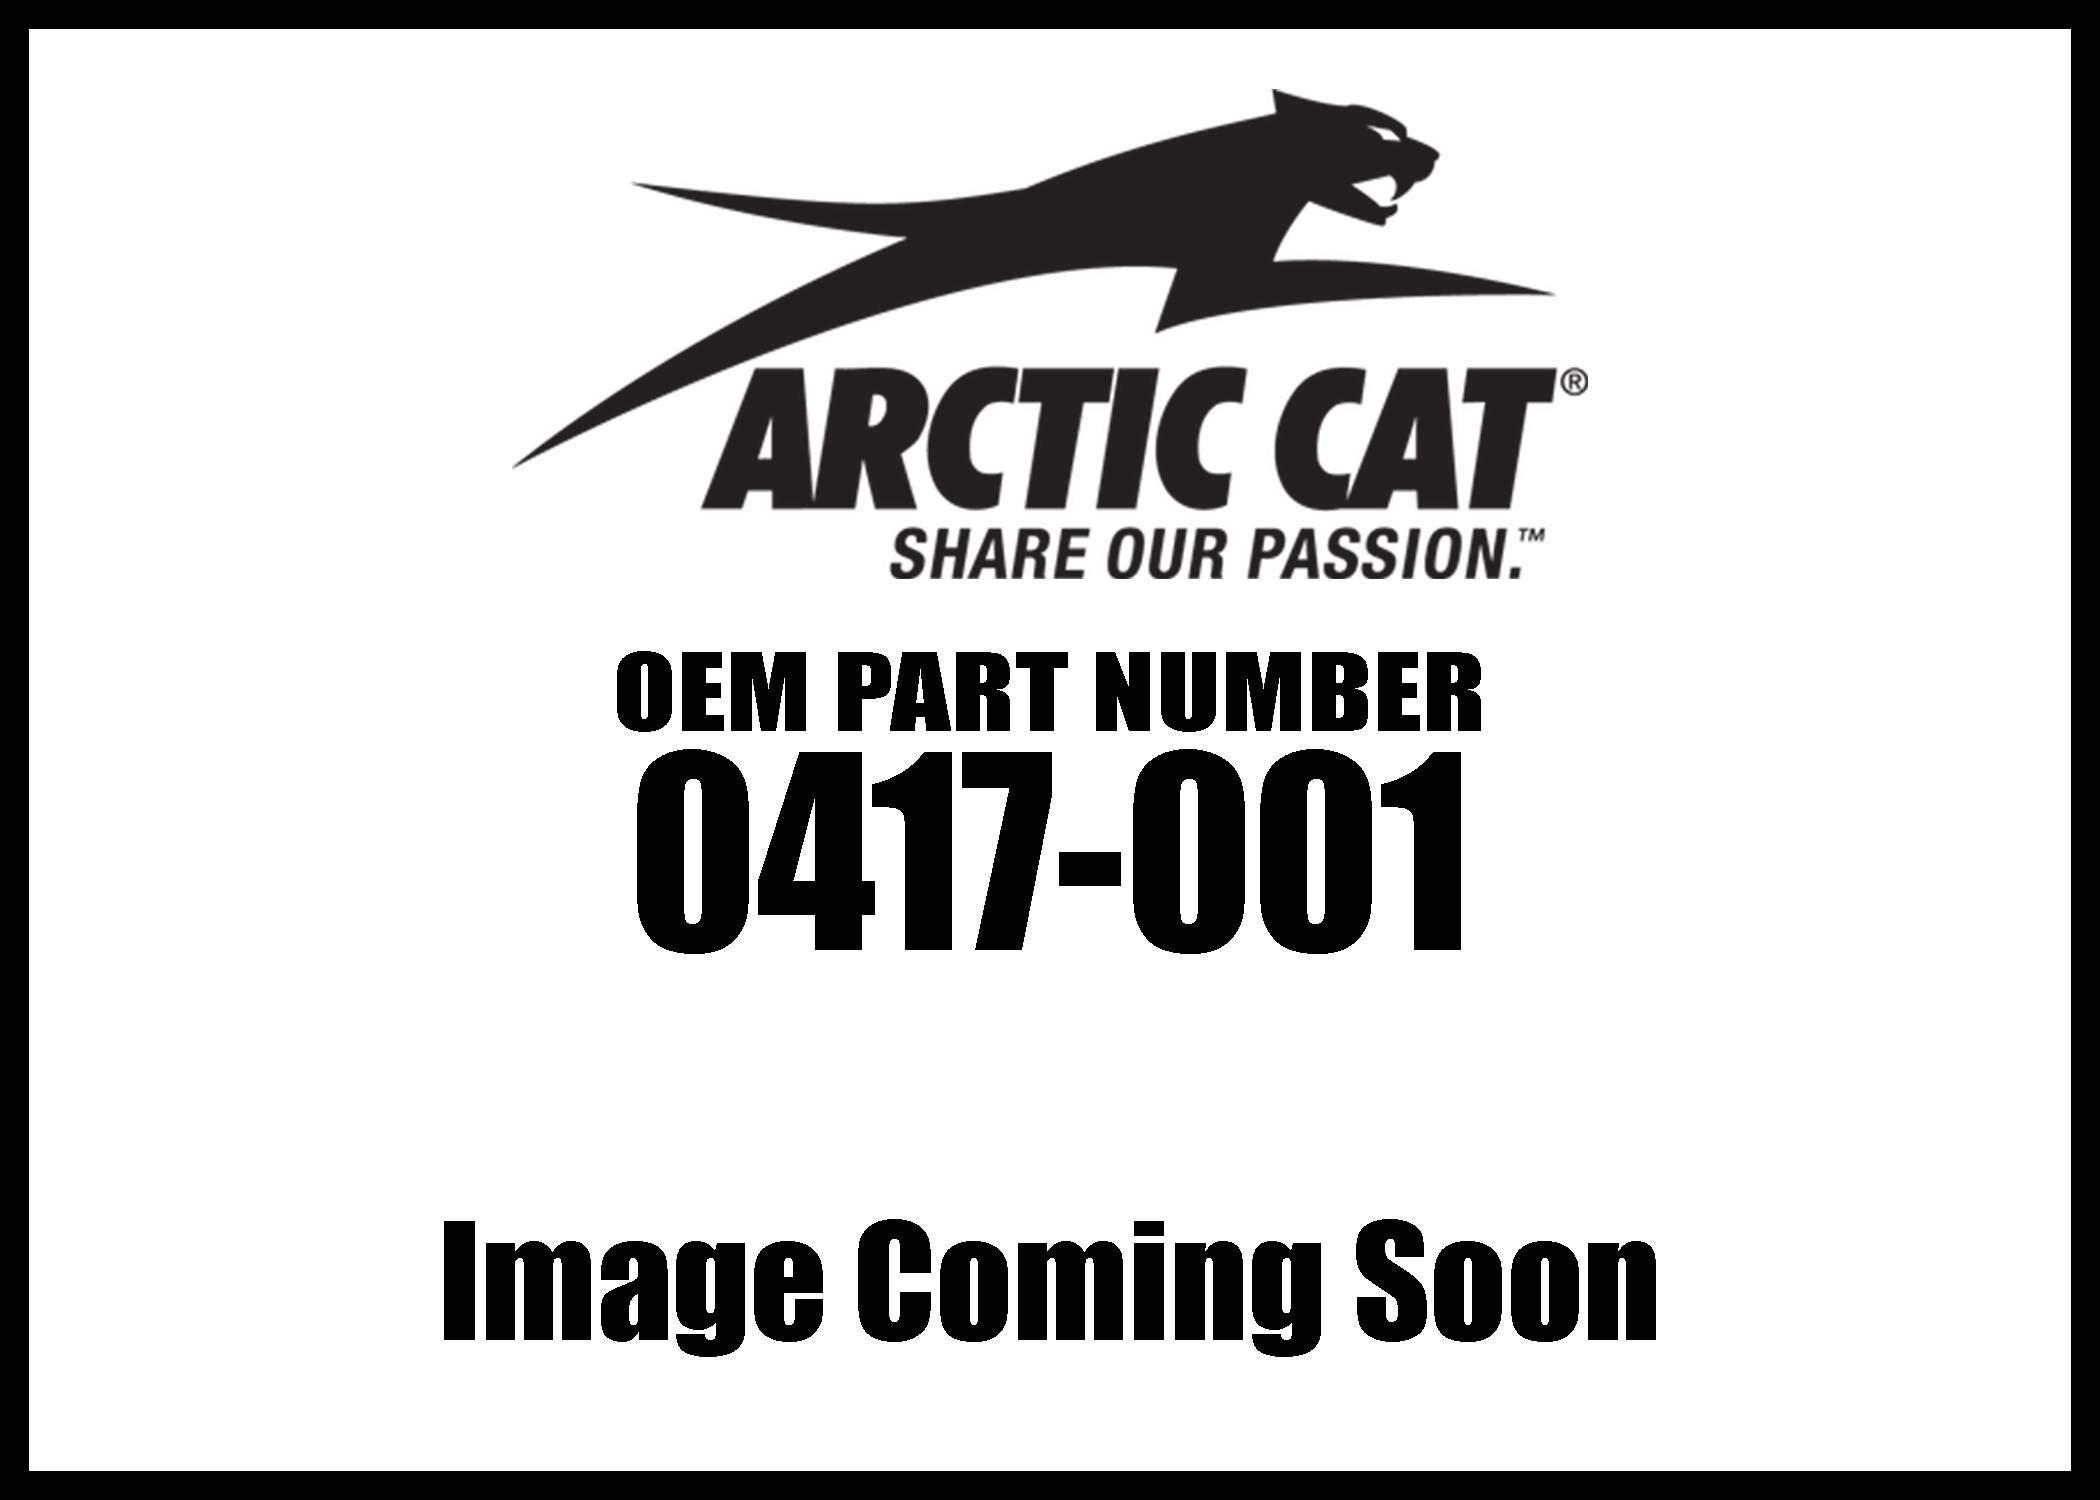 Arctic Cat 1997-2005 Atv 500 4X4 Atv 400 4X4 Pad Fuel Tank 0417-001 New Oem